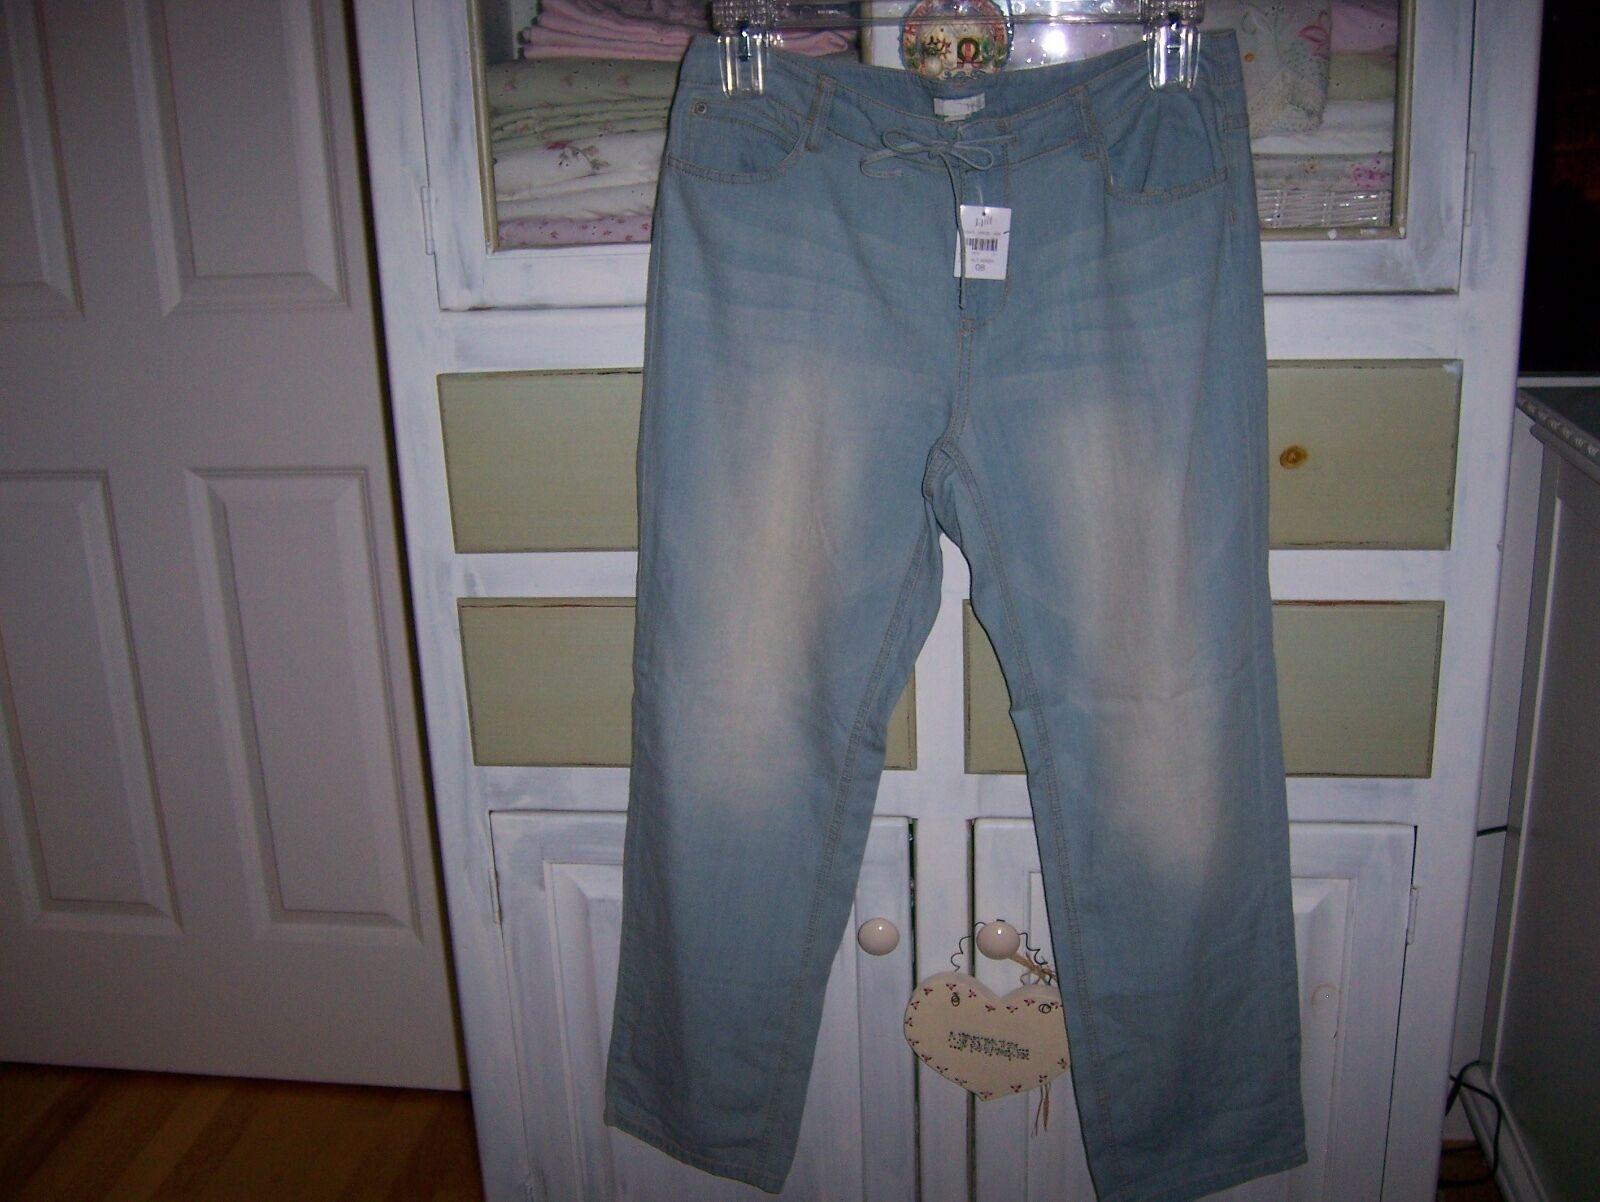 NWT 89 J.Jill Saltwash Denim Blau Summer Wt Crop Capri Jeans 100%Cotton 8 S M